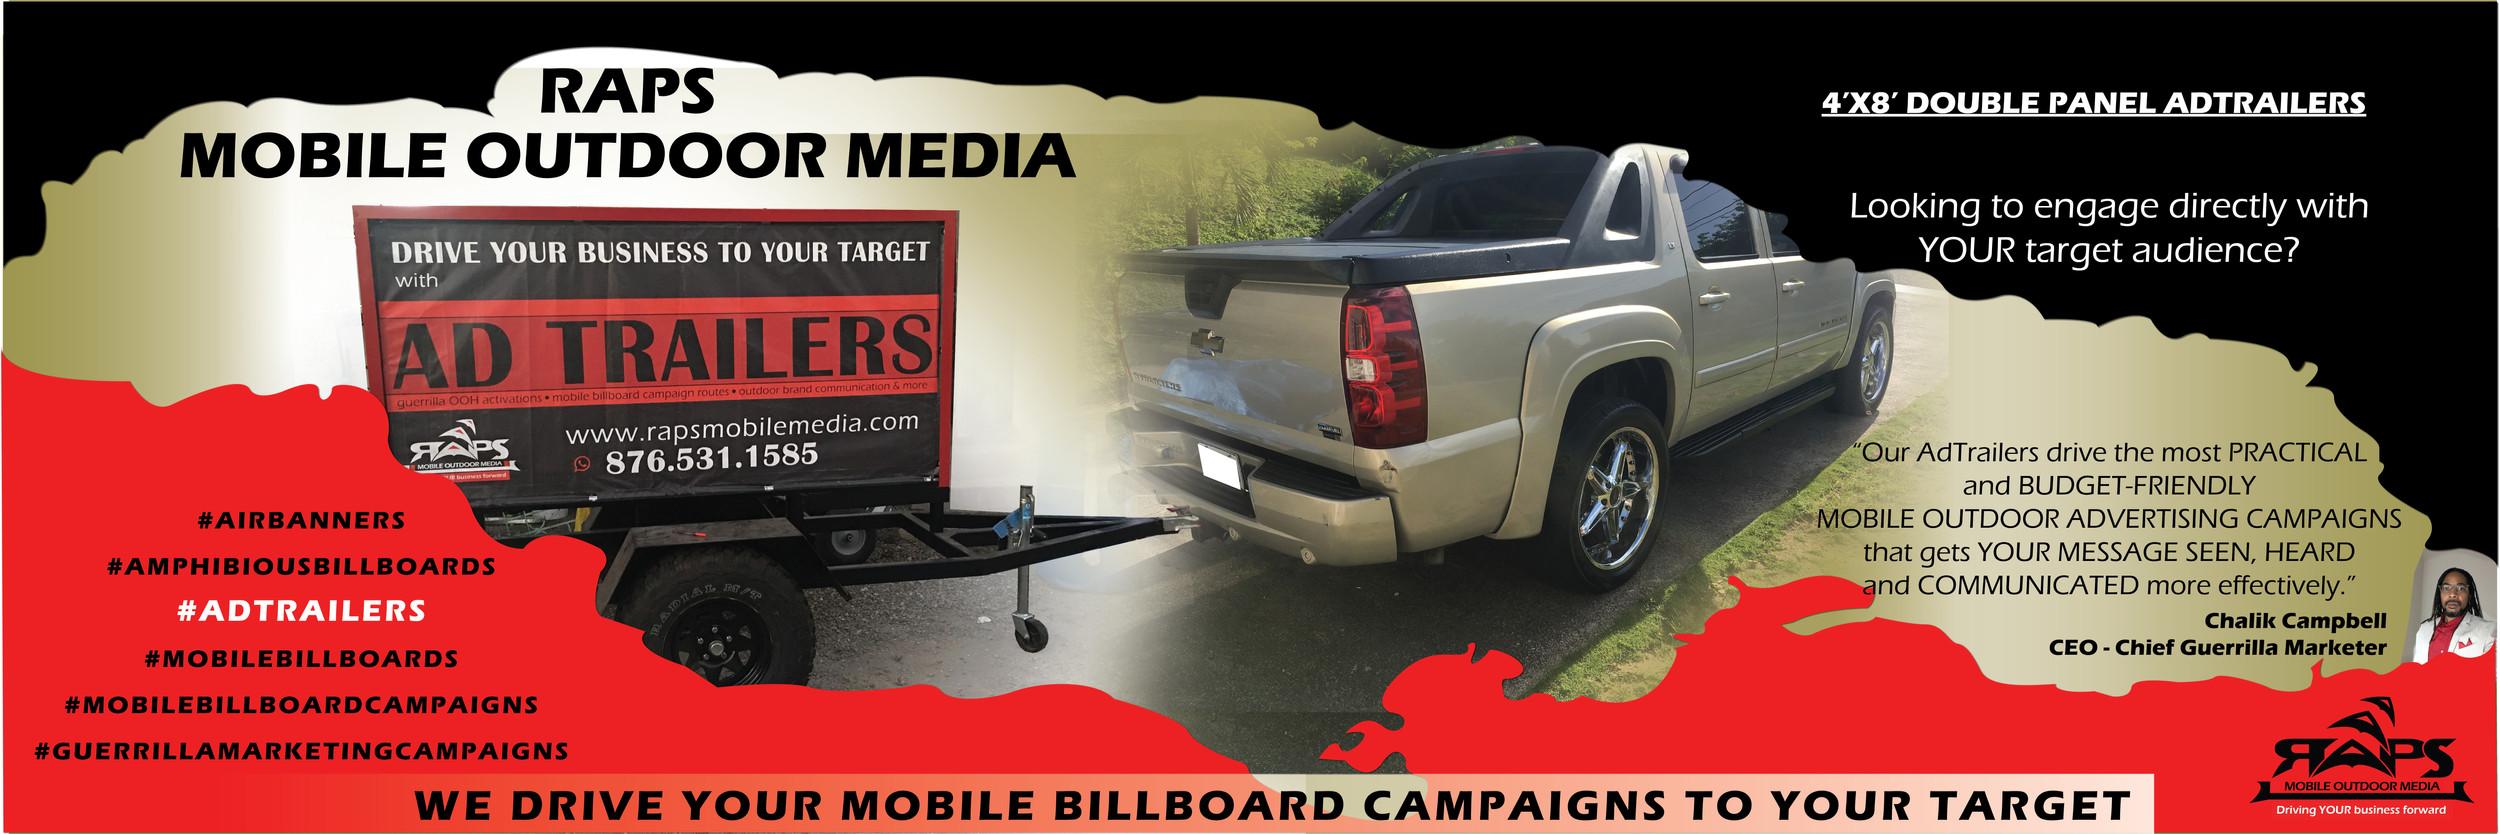 OOH Media | RAPS Mobile Outdoor Media | outdoor advertising